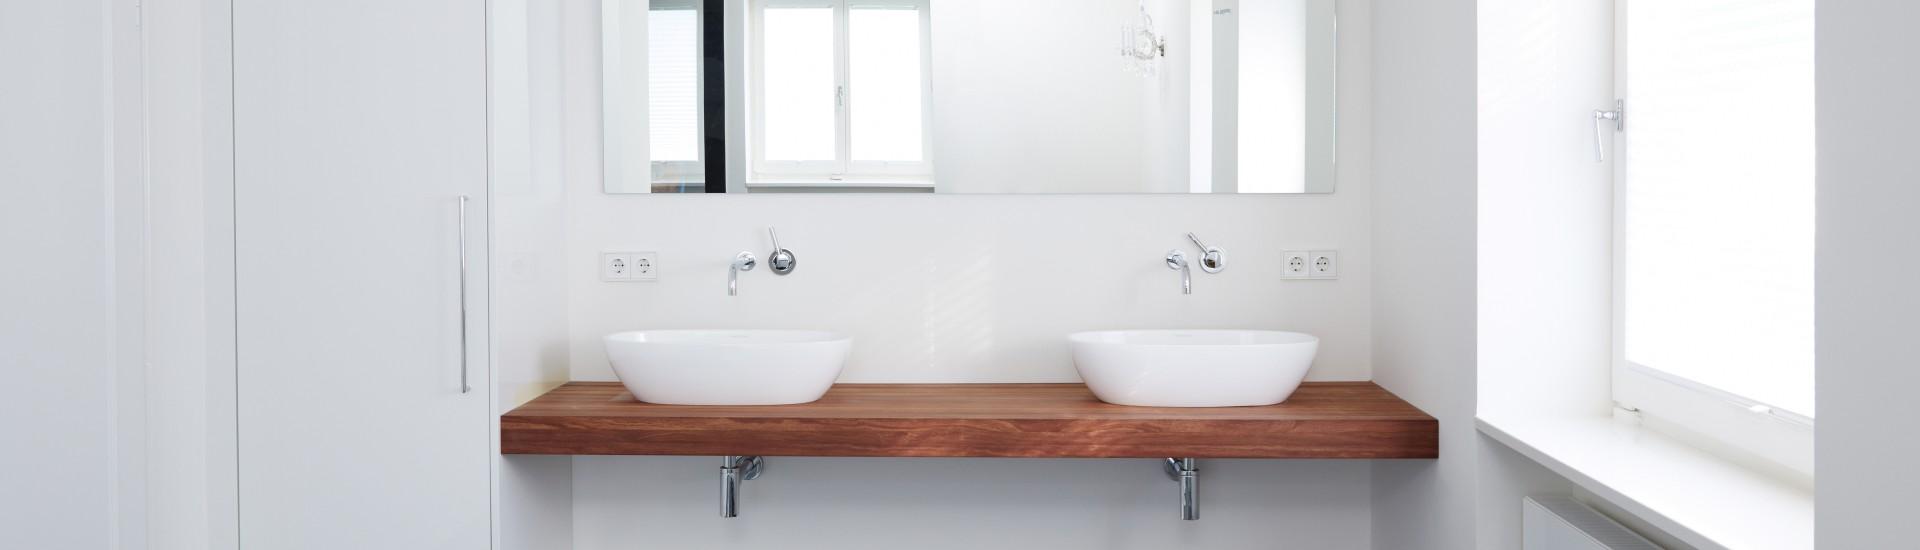 attractive badezimmer waschtischplatte #1: Willi Curdt